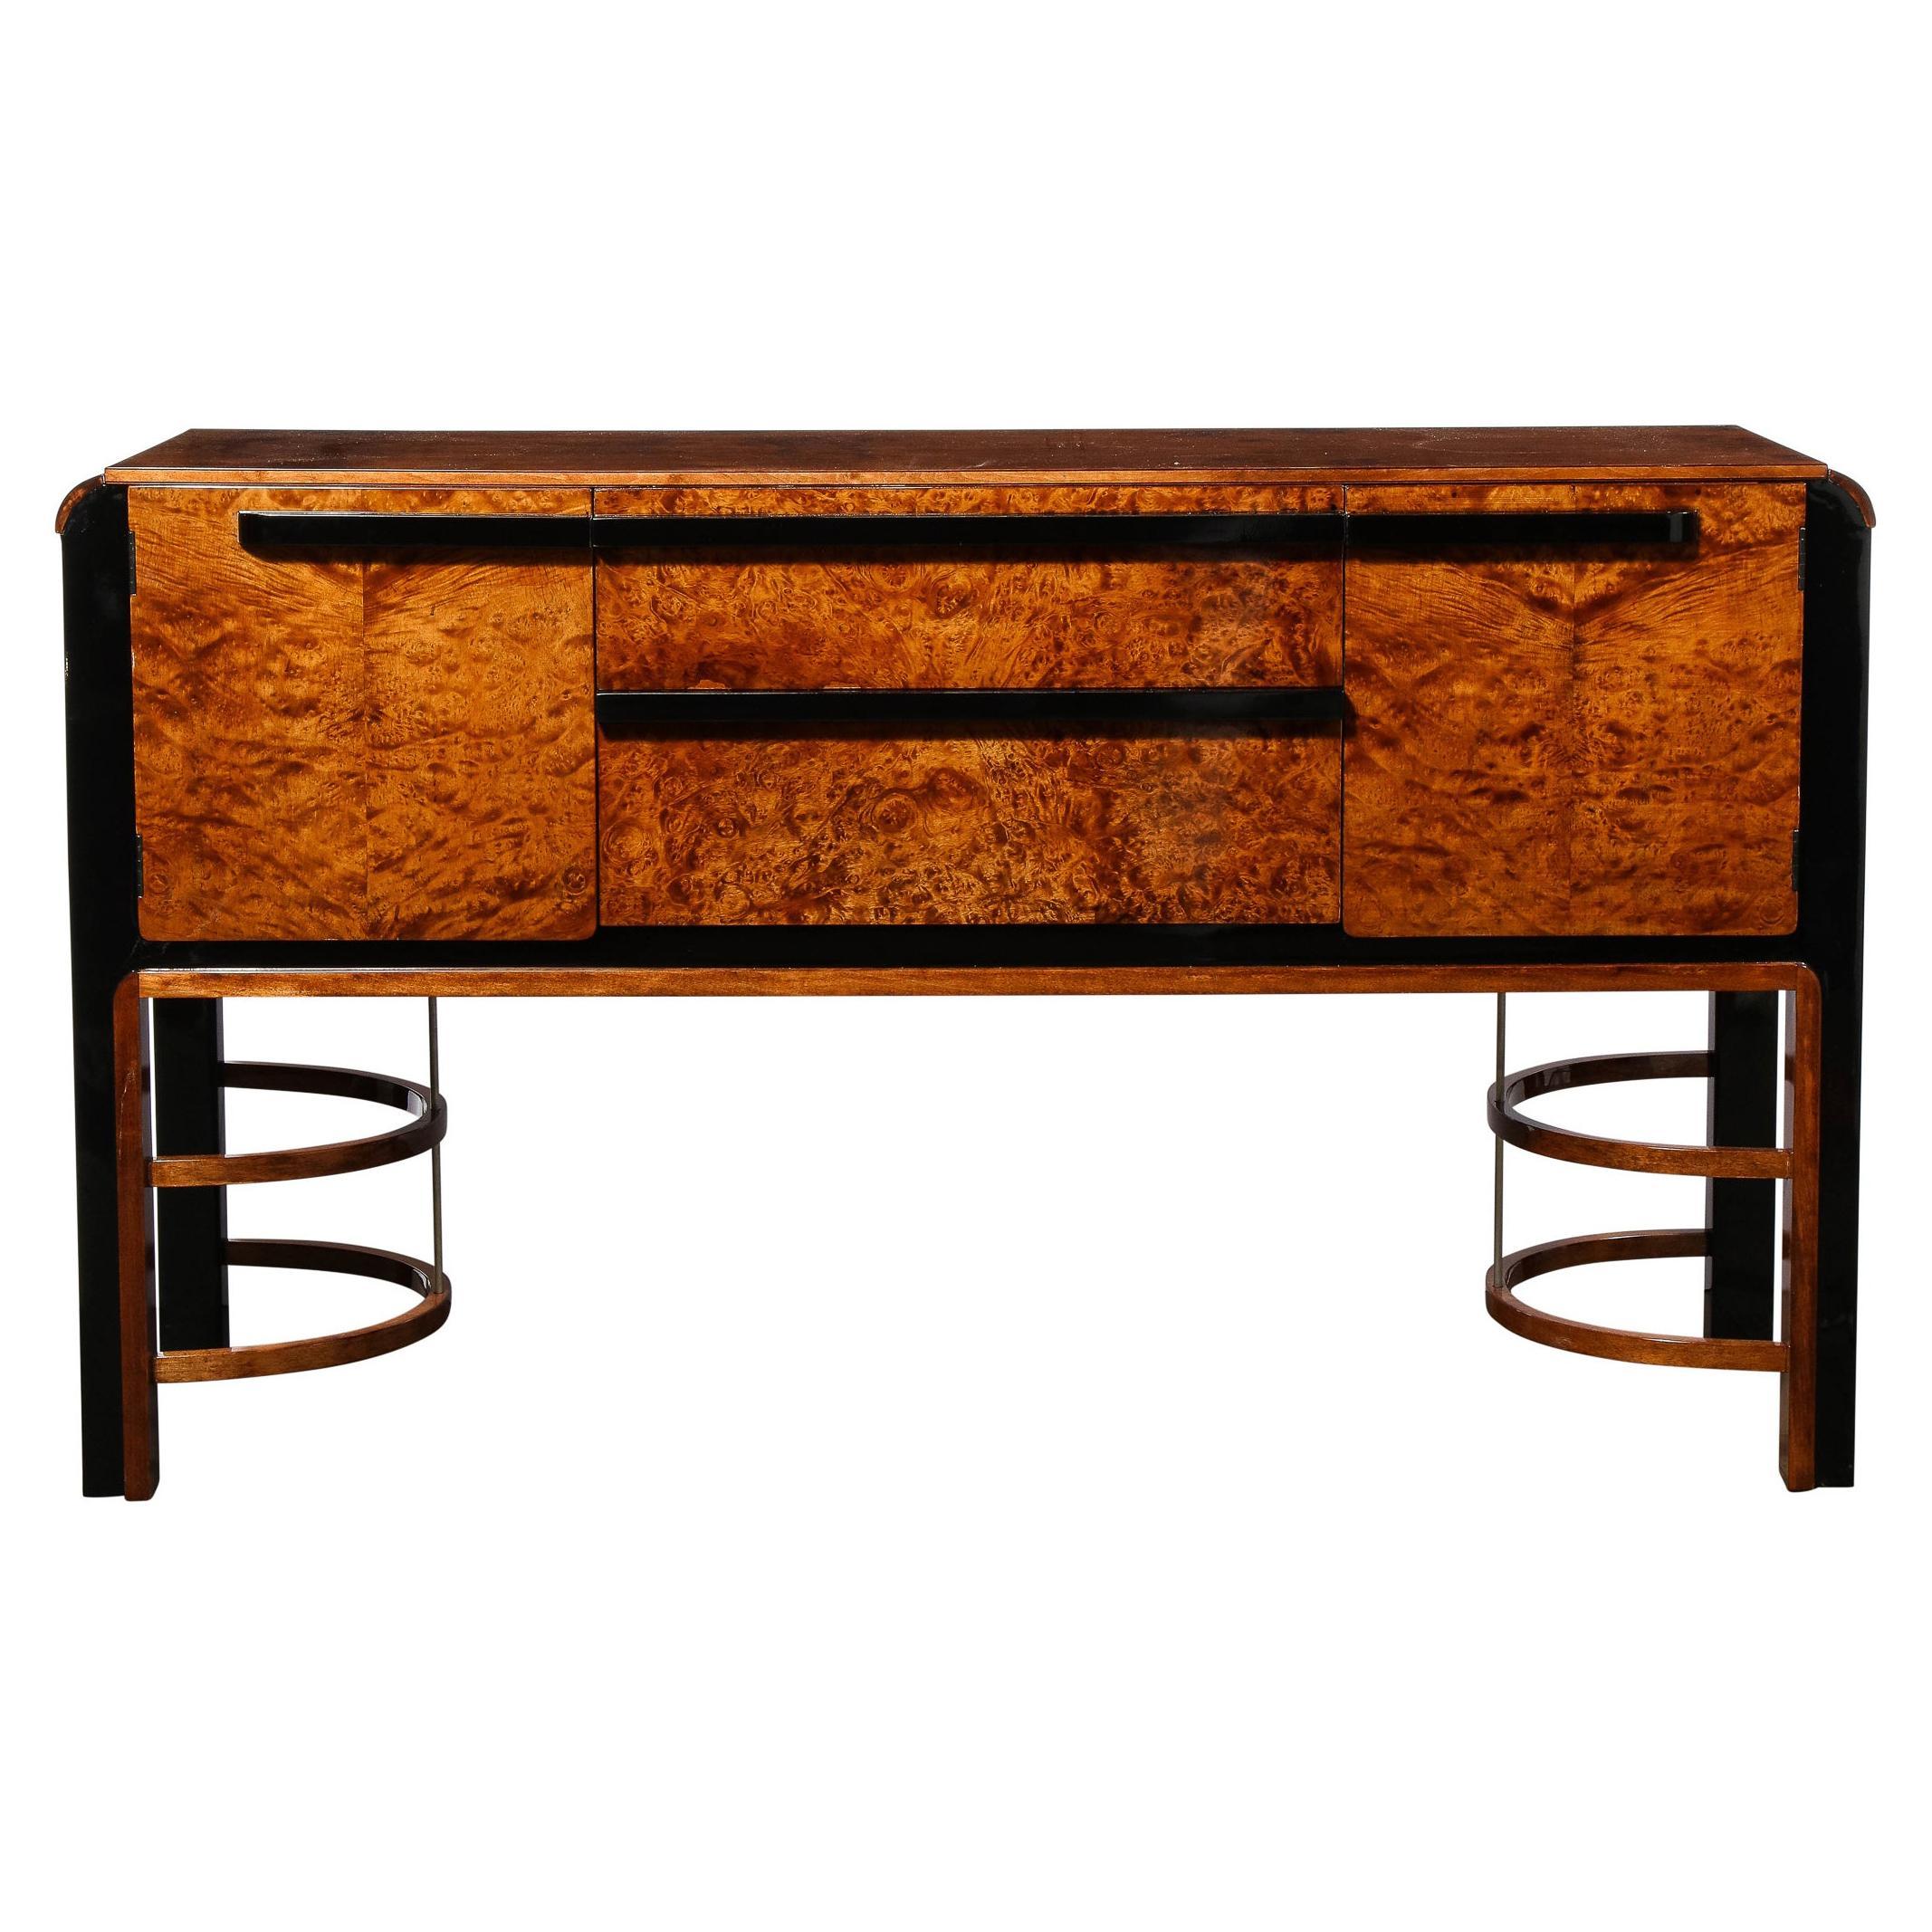 Donald Deskey Art Deco Black Lacquer, Burled Carpathian Elm & Walnut Sideboard